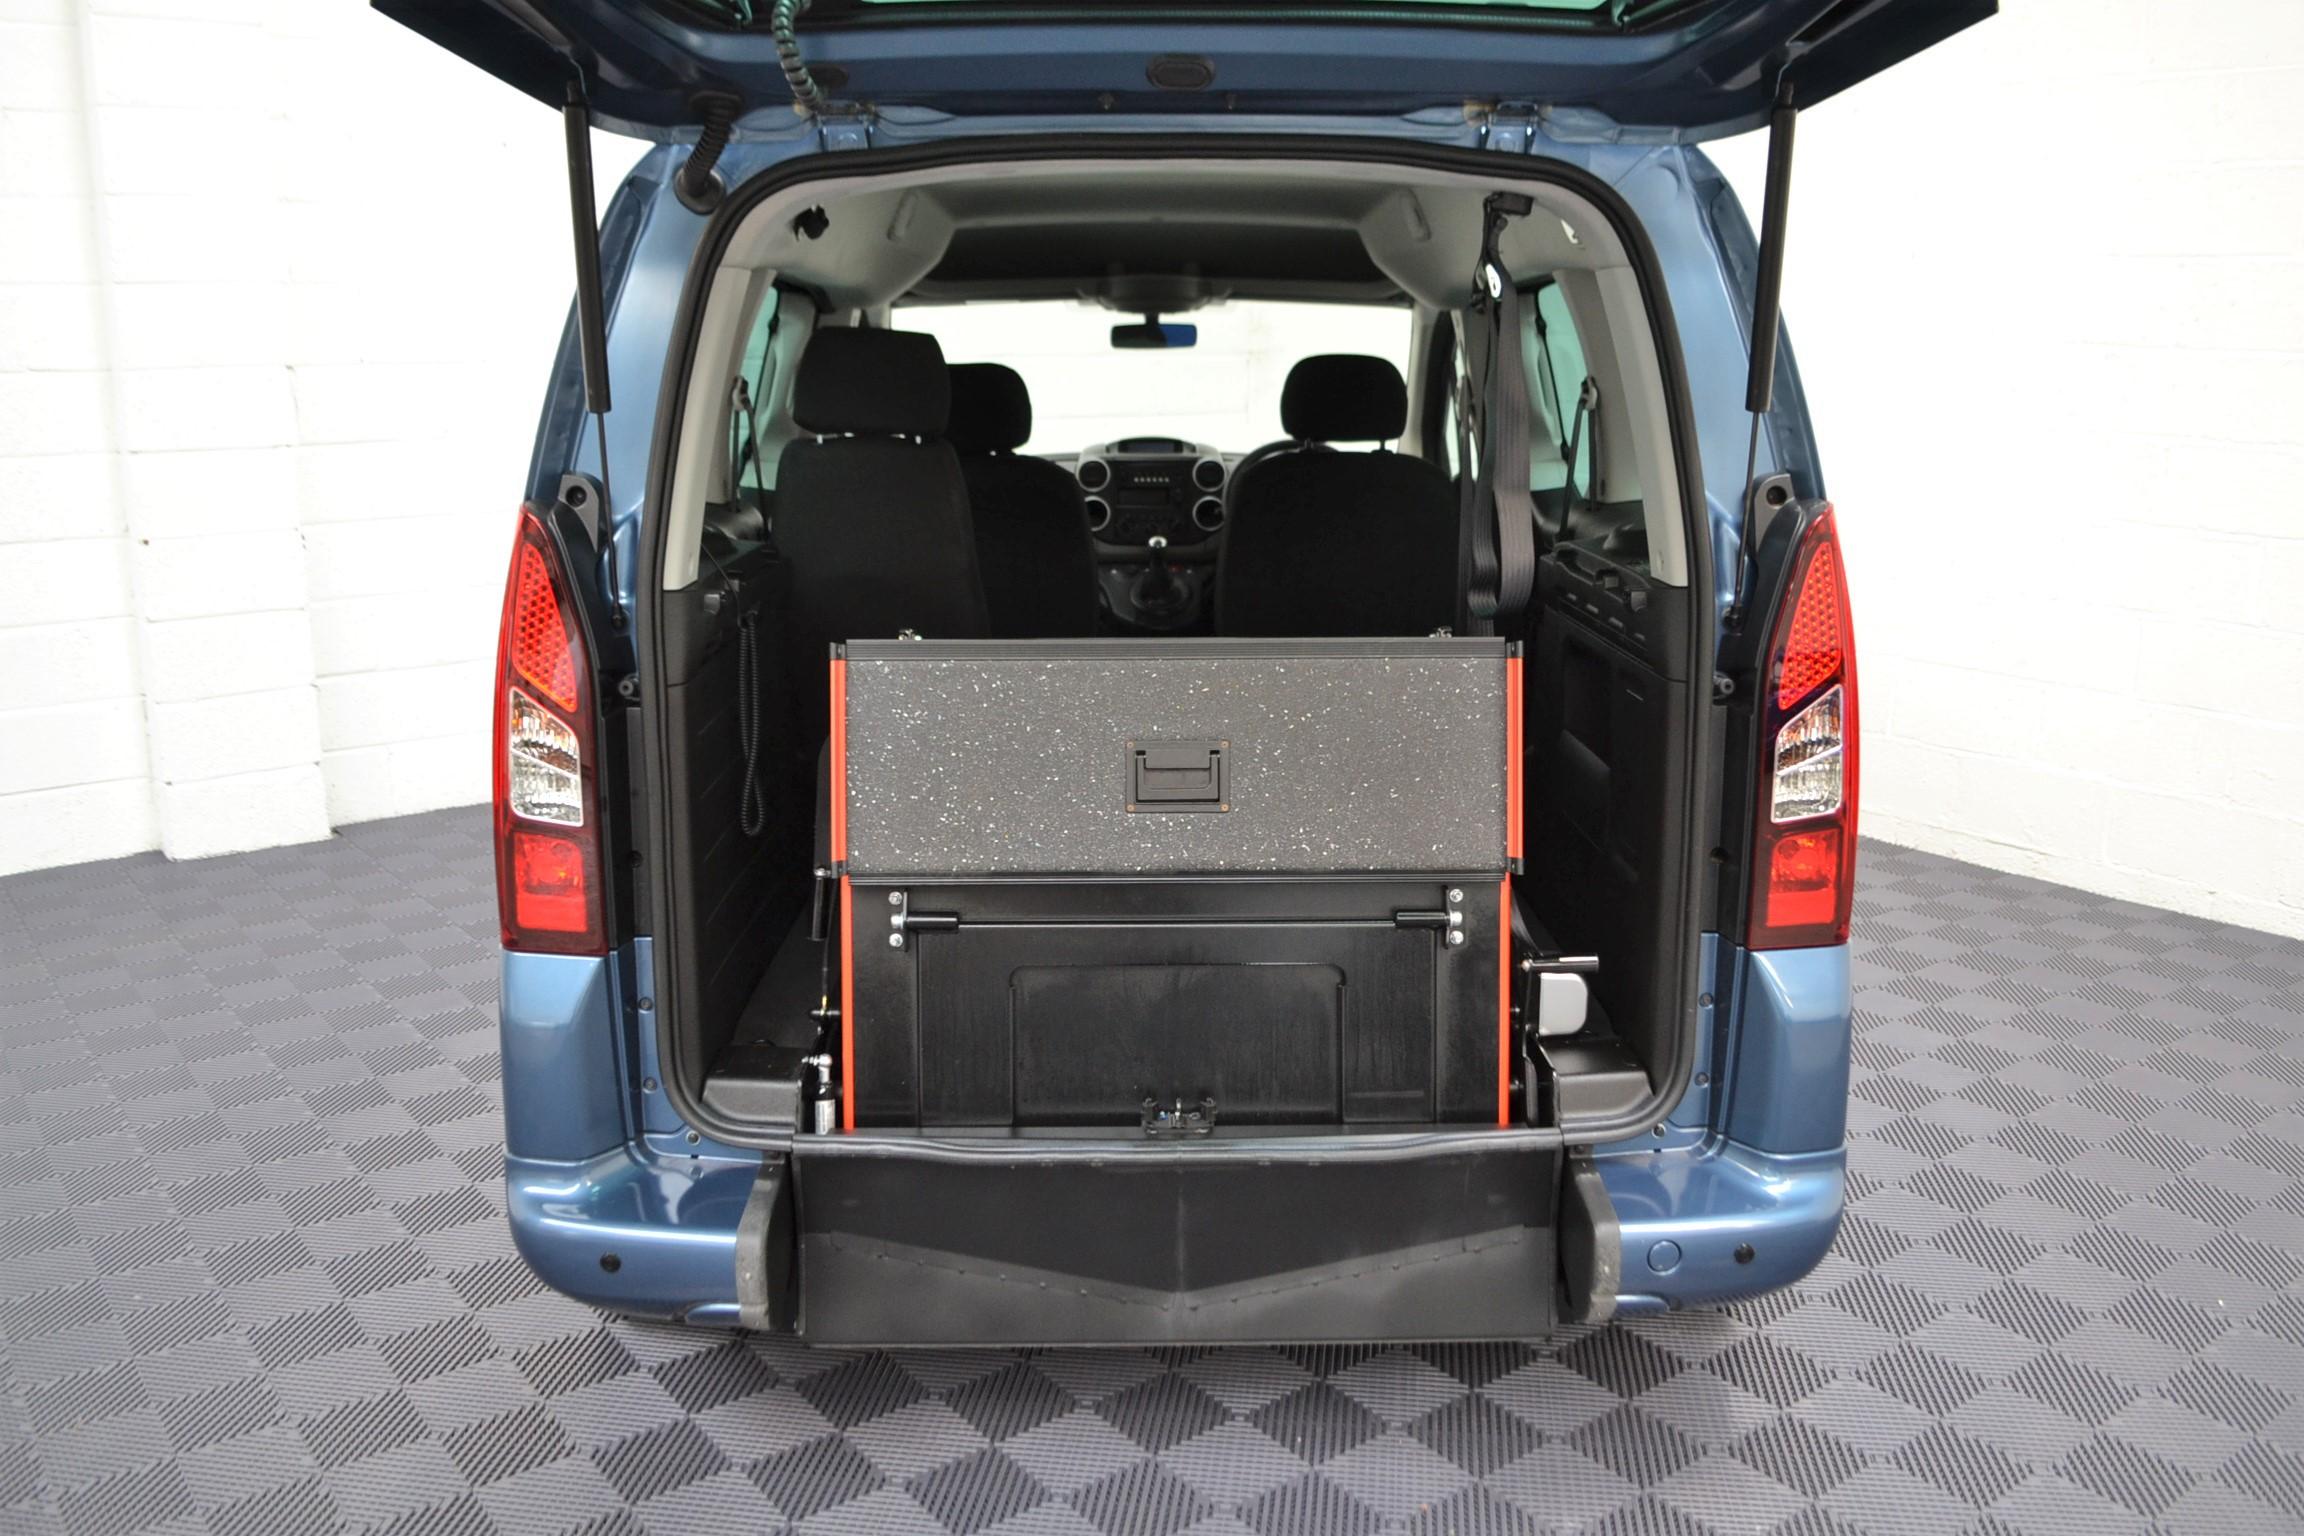 WAV Cars For Sale Bristol Wheelchair Accessible Vehicles Used For Sale Somerset Devon Dorset Bath Peugeot Partner SF67 EEA 7